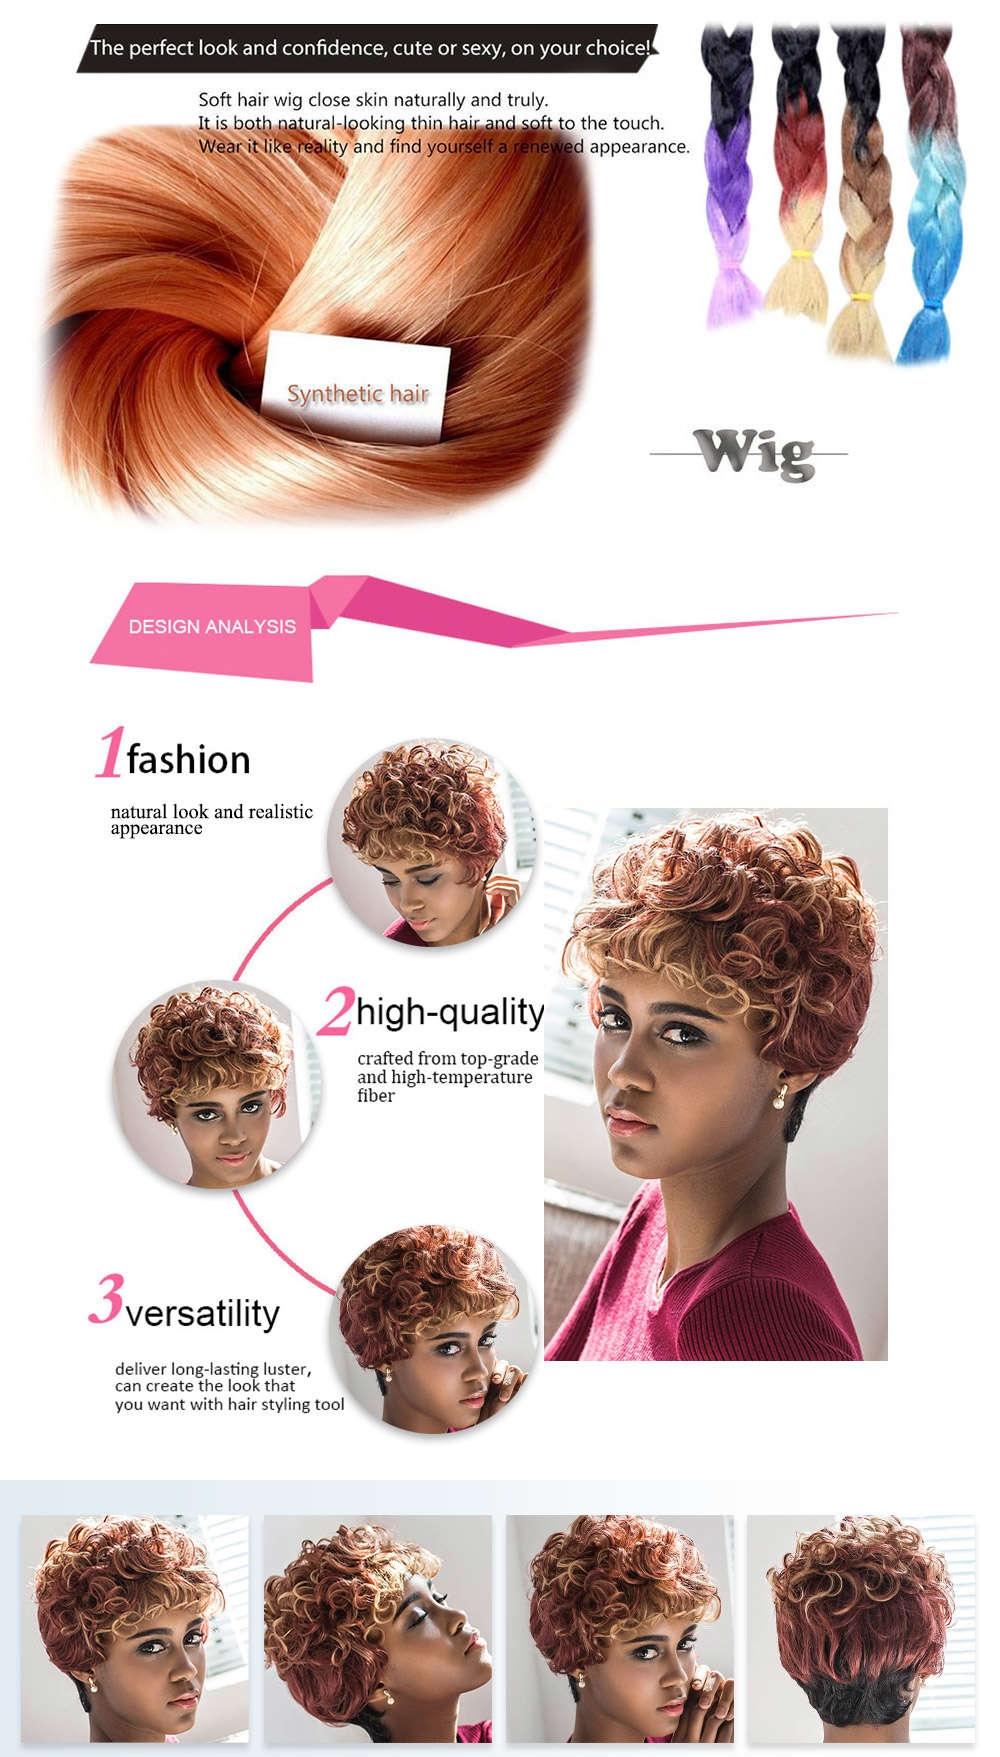 Buy aisi hair aisihair stunning short round curly full bangs mixed wigs careg aisihair stunning short round curly full bangs mixed color wigs for women solutioingenieria Choice Image